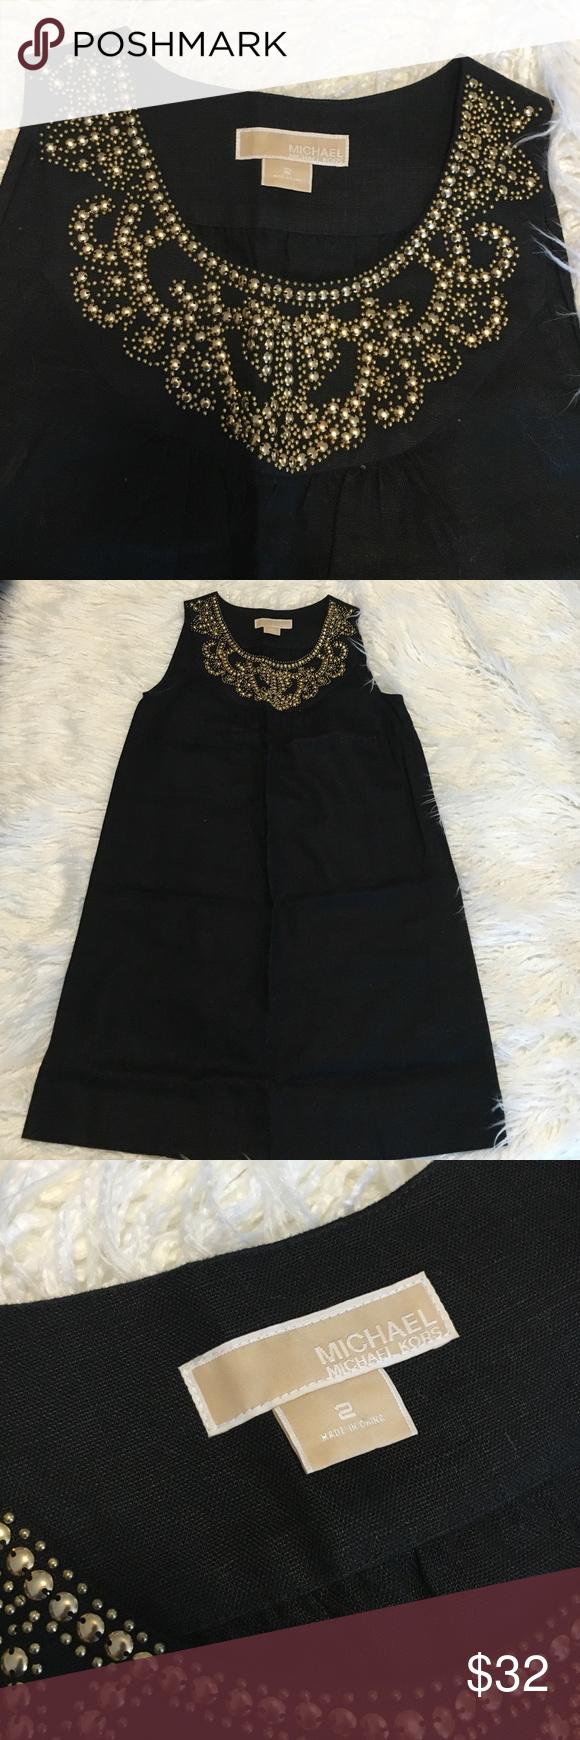 Michael kors linen dress Worn once. Price is firm. Michael Kors Dresses Mini